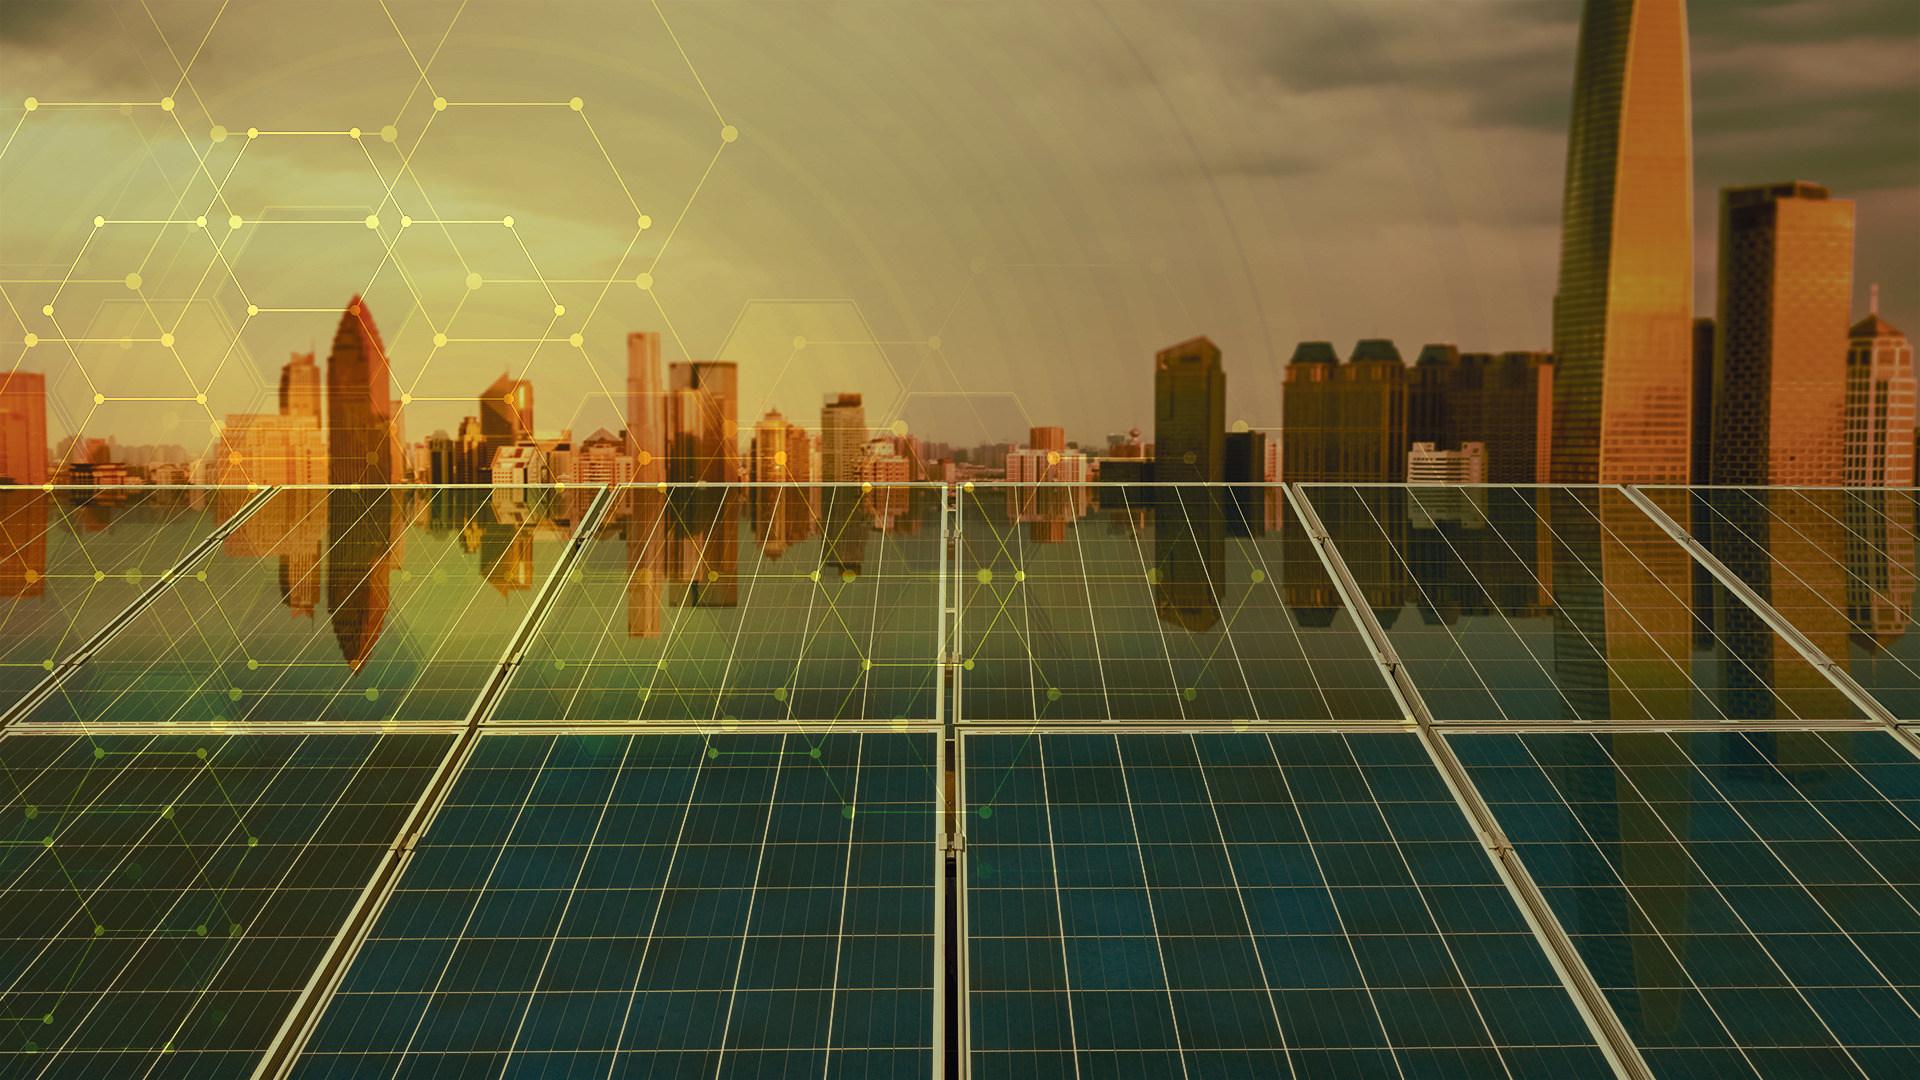 Energie, Strom, Stromversorgung, Solar, Solarzelle, Stromnetz, Solarenergie, Solarpanel, Solarzellen, Solarmodul, Solarstrom, Photovoltaik, SolarCity, Solaranlage, Solarfeld, Solarpark, Sonnenenergie